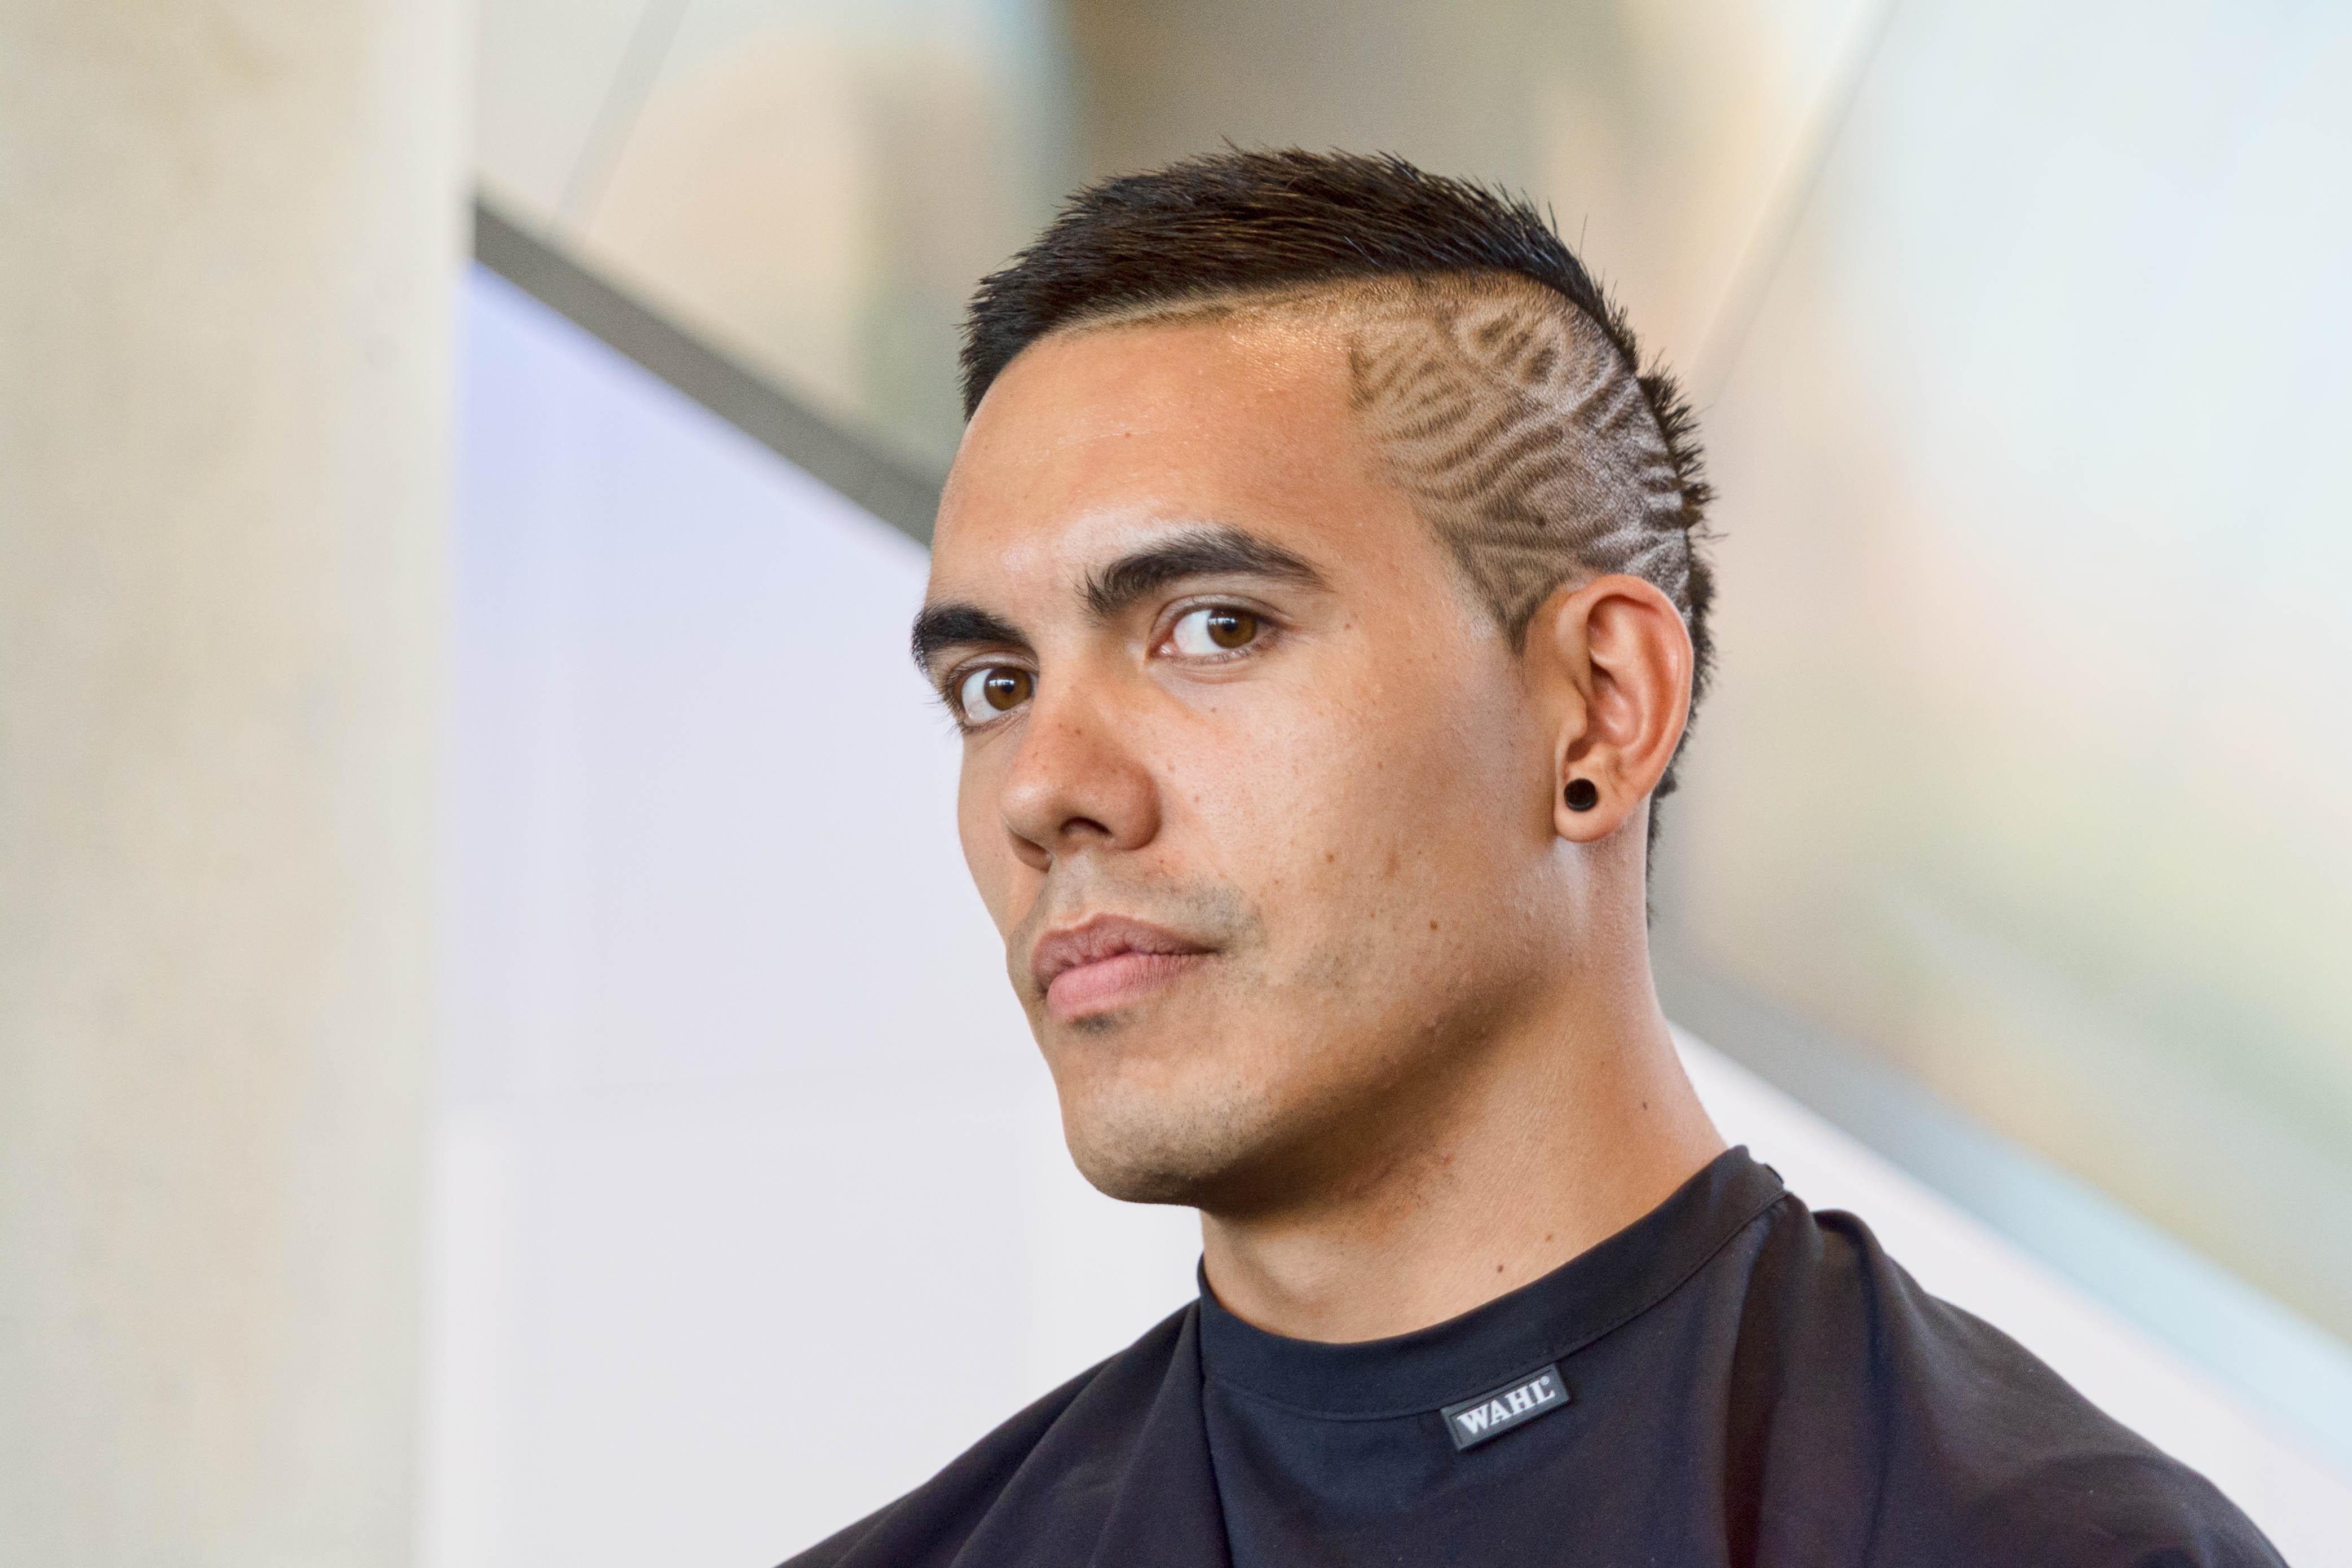 Fotos Gratis Hombre Persona Cabello Retrato Tatuaje